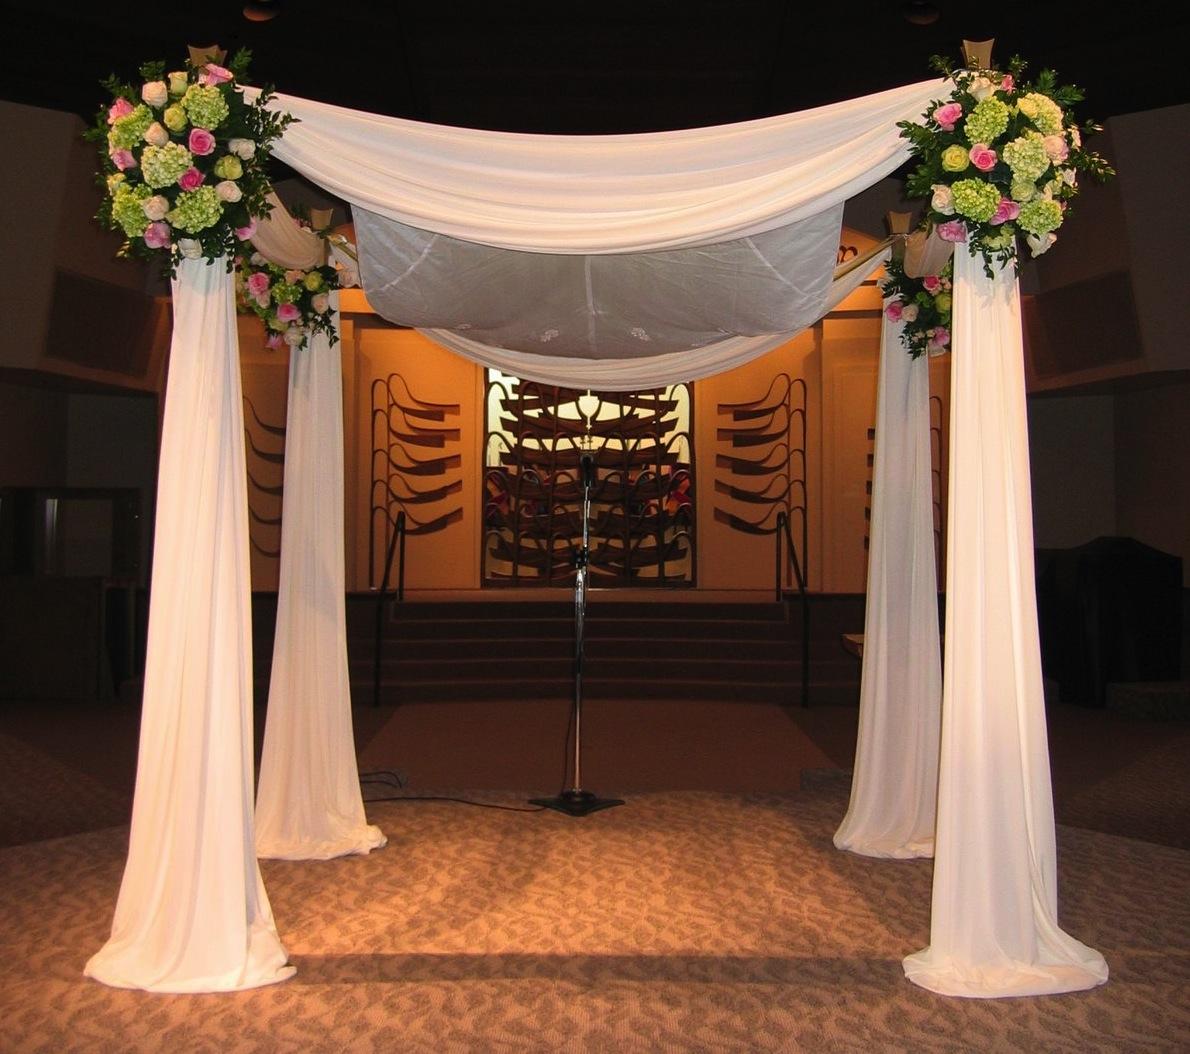 Wedding Canopy Decoration Ideas: FlowerDuet.com